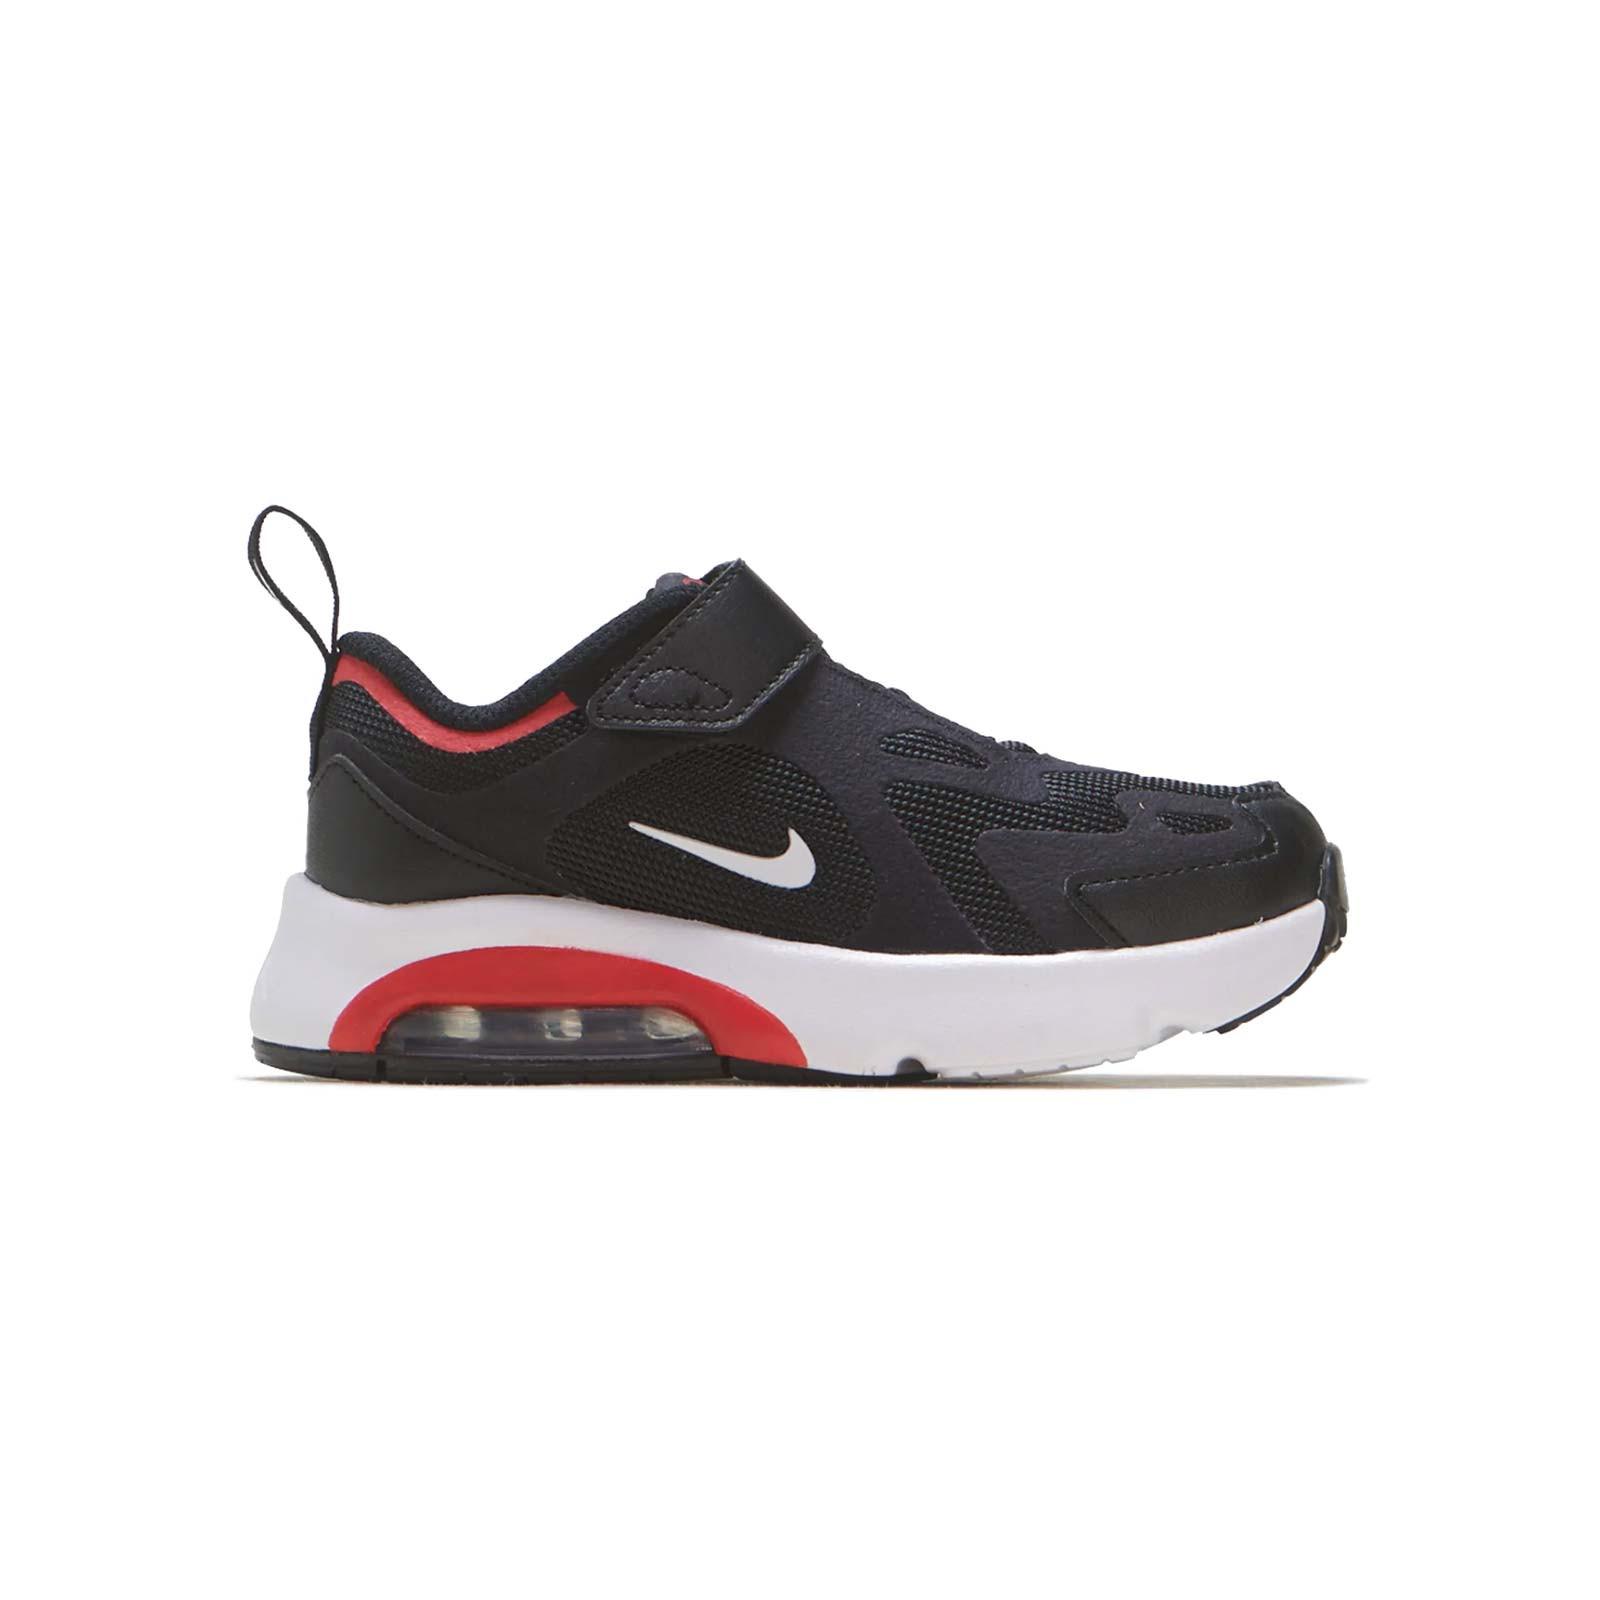 cartel oscuro contar hasta  Zapatillas Nike Air Max 200 Bt Sportswear para Niño   Runa Store